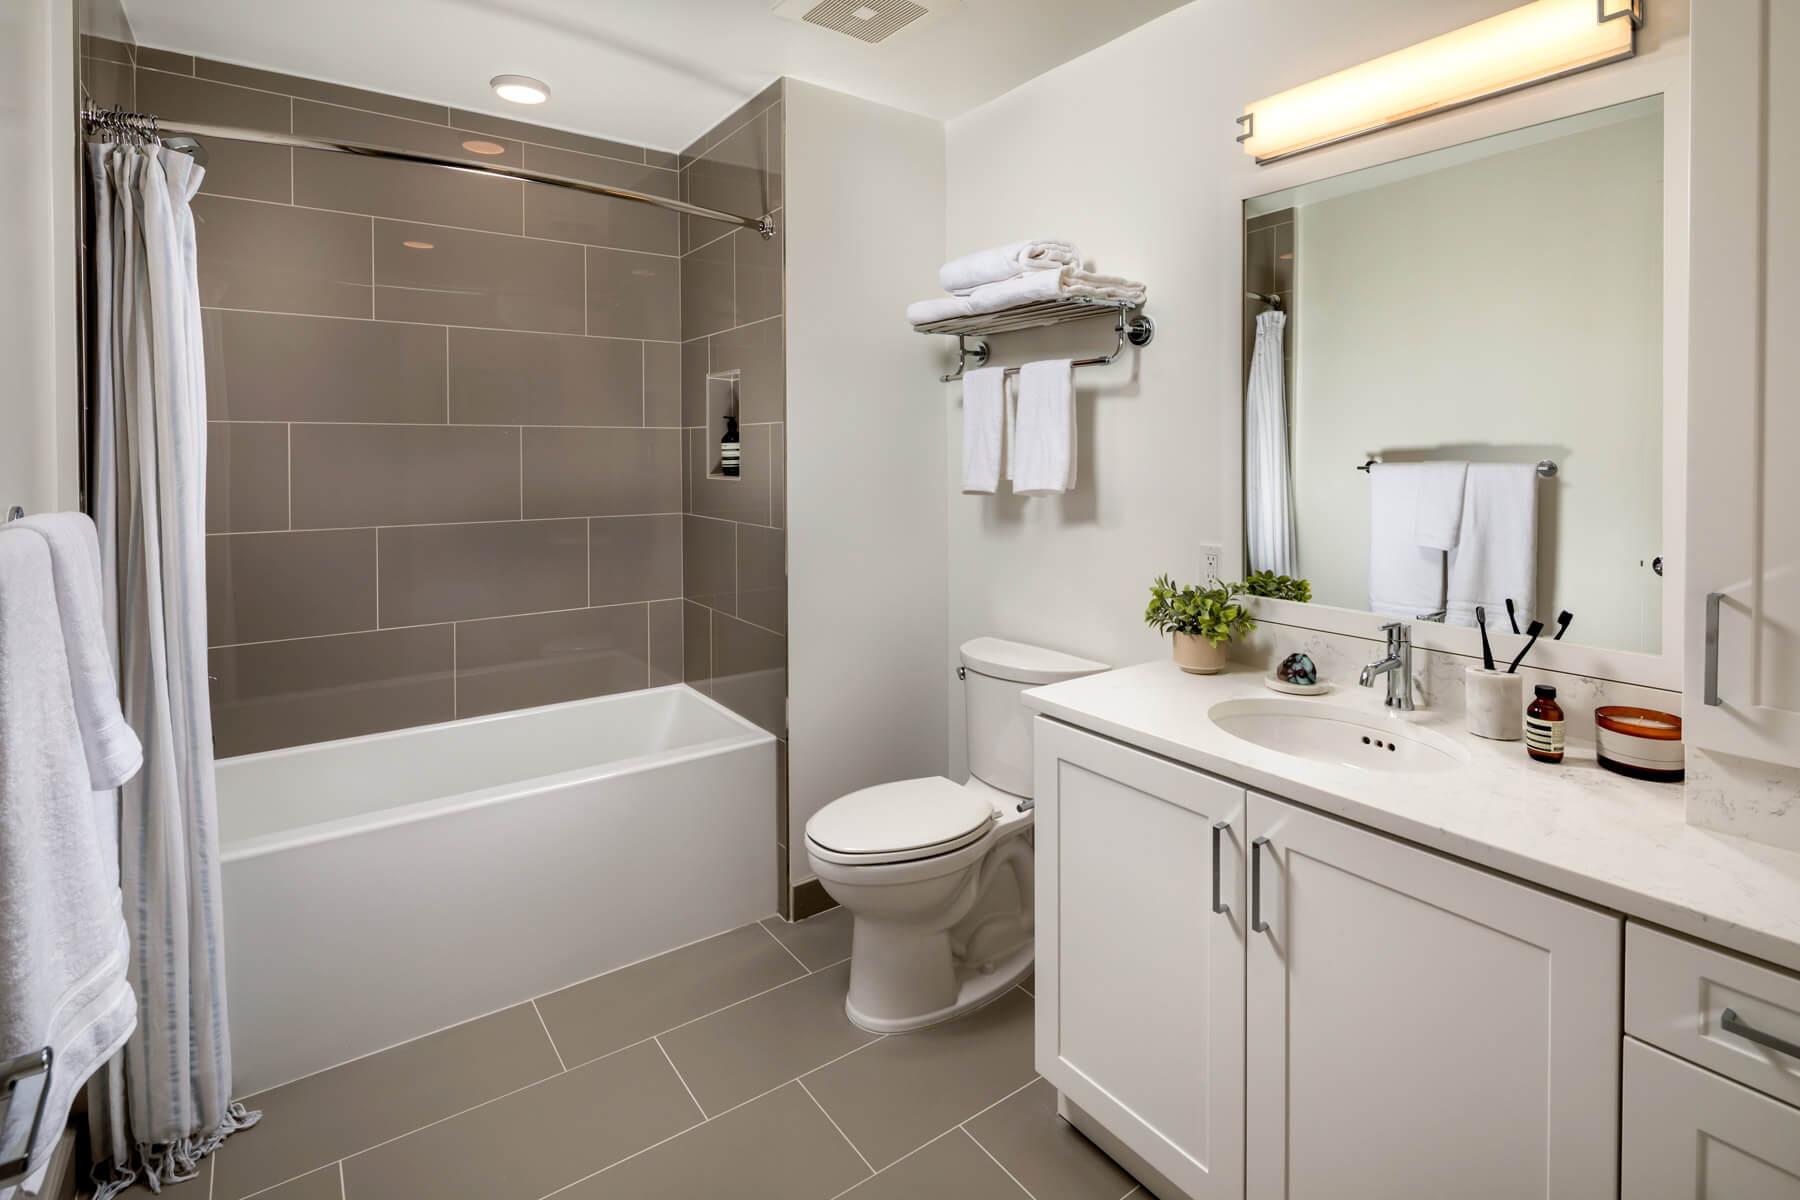 Two Bedroom Residence Master Bedroom Bathroom